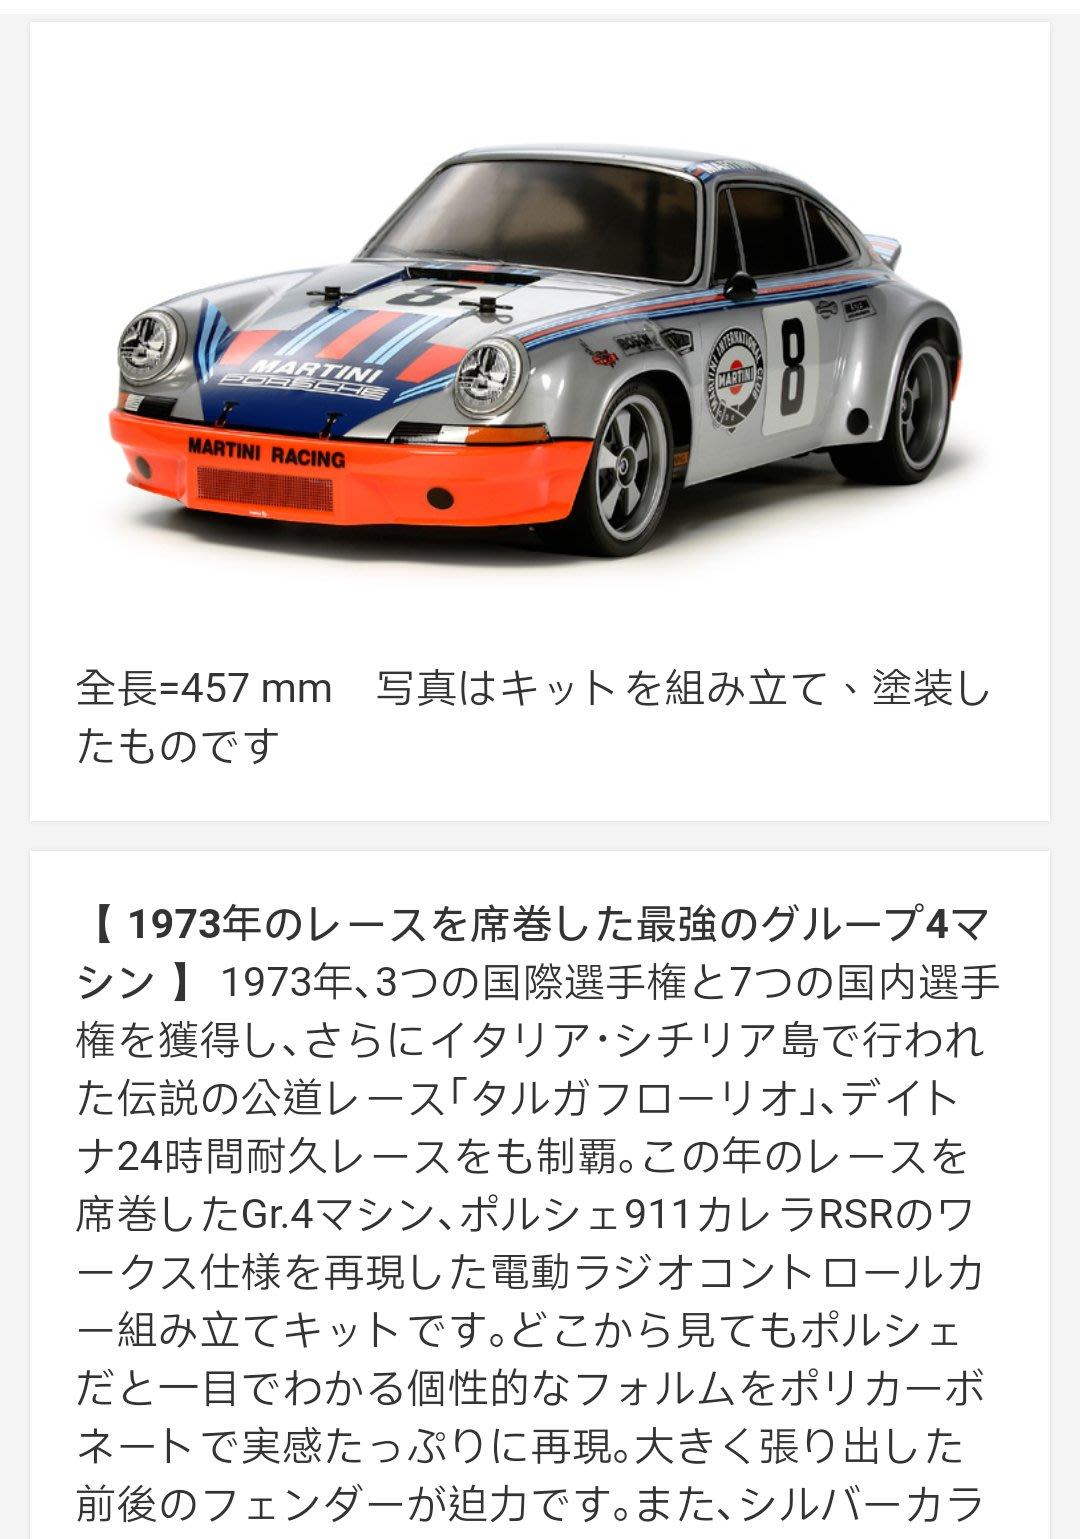 田宮 TAMIYA 1/10RC Porsche 911 Carrera RSR MARTINI